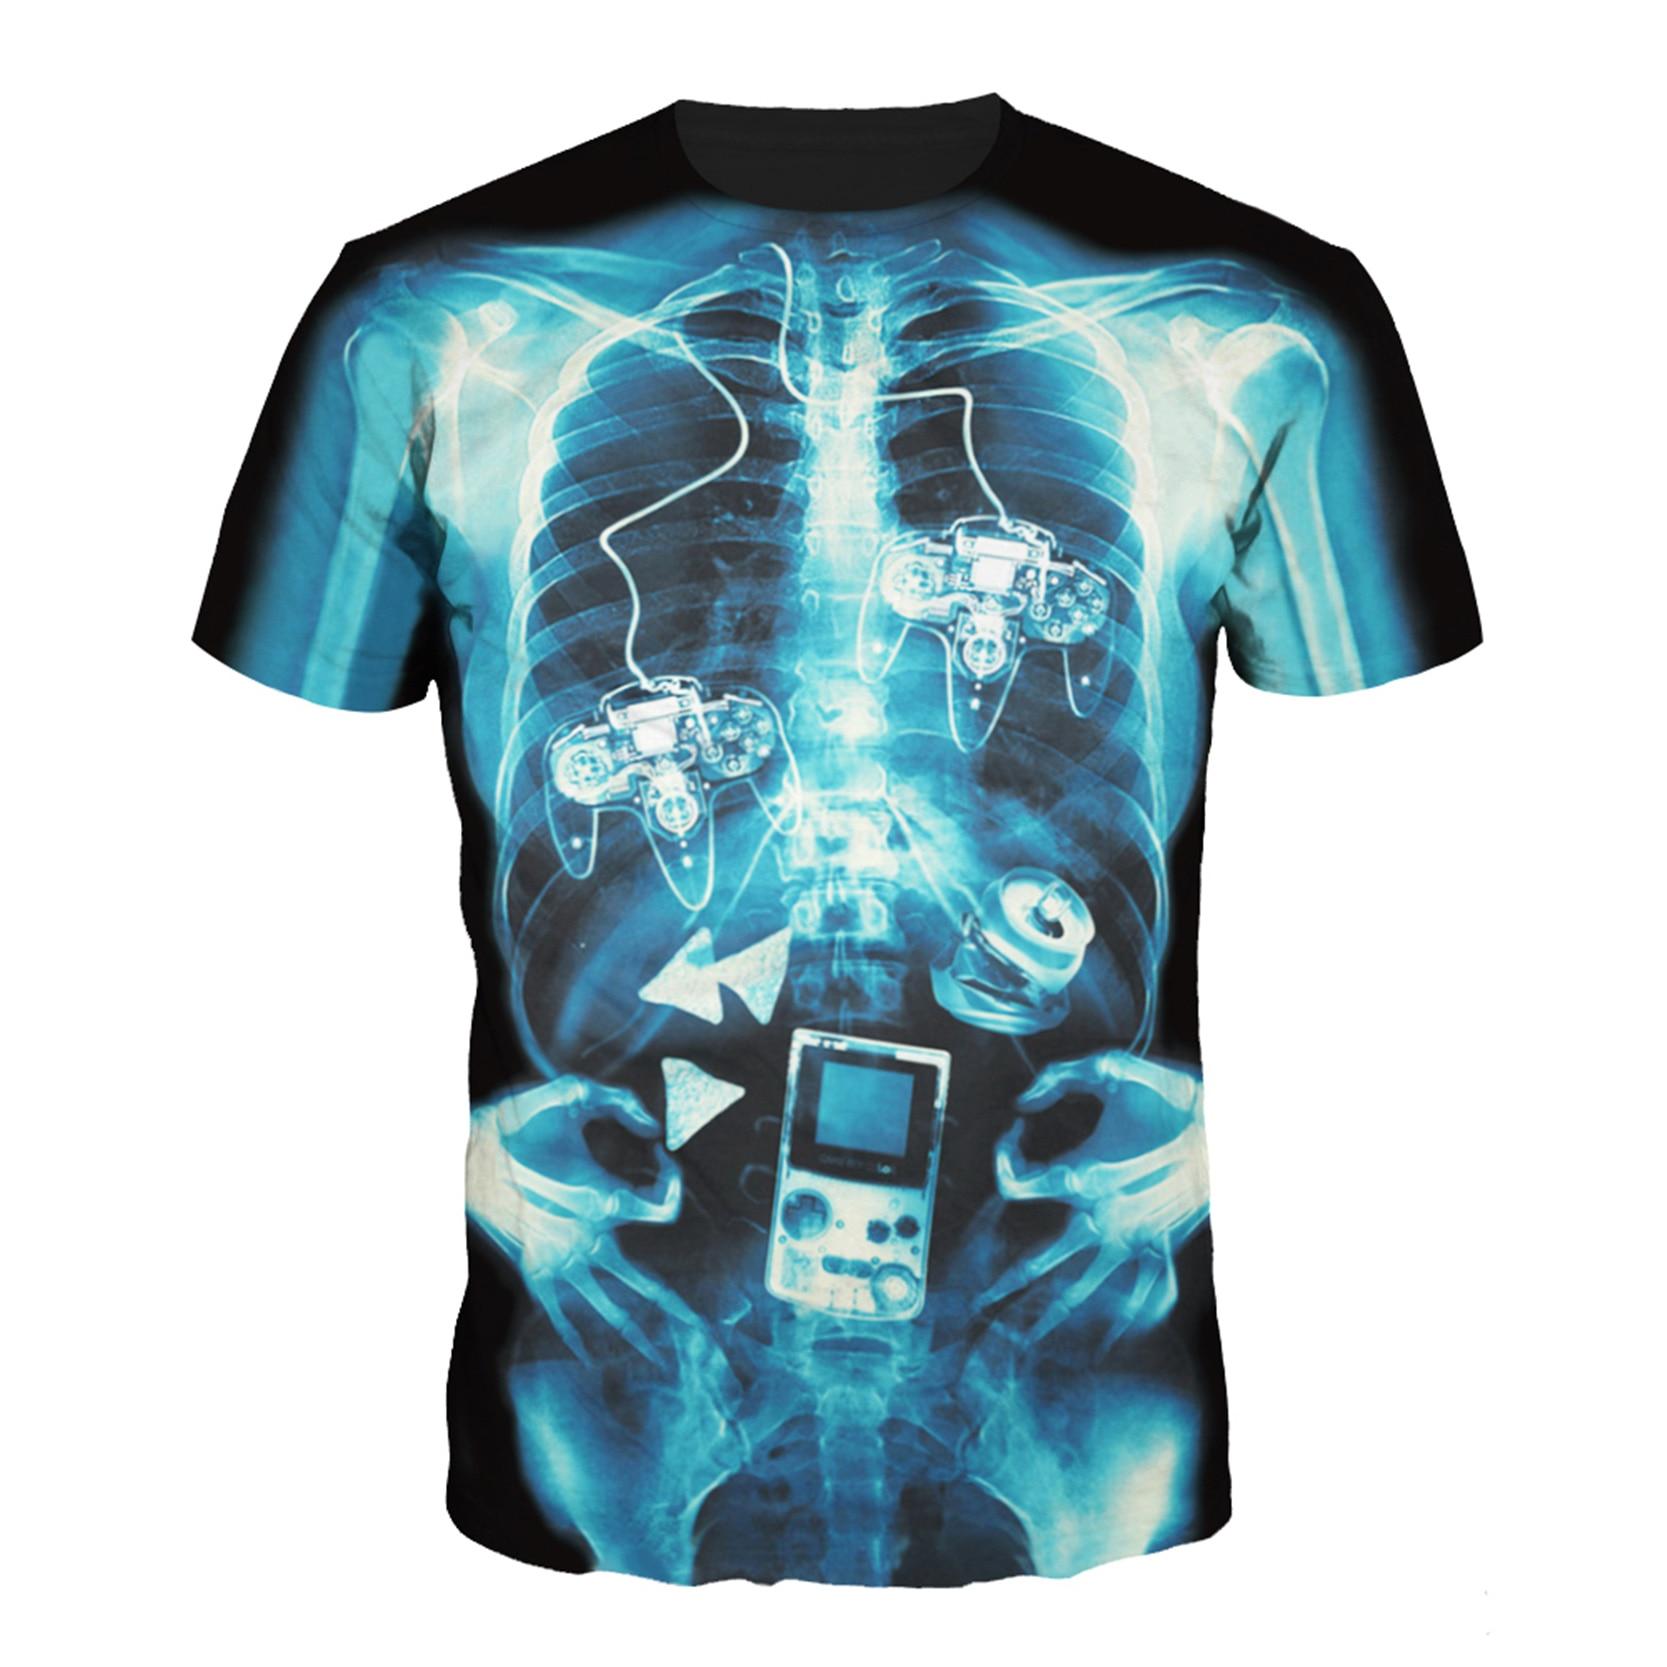 Human design t shirt - Trendy Men T Shirt Mysterious Human Skeleton Bright Punk Rock Design 3d Print Short Sleeve T Shirt Best Friends Gift In T Shirts From Men S Clothing